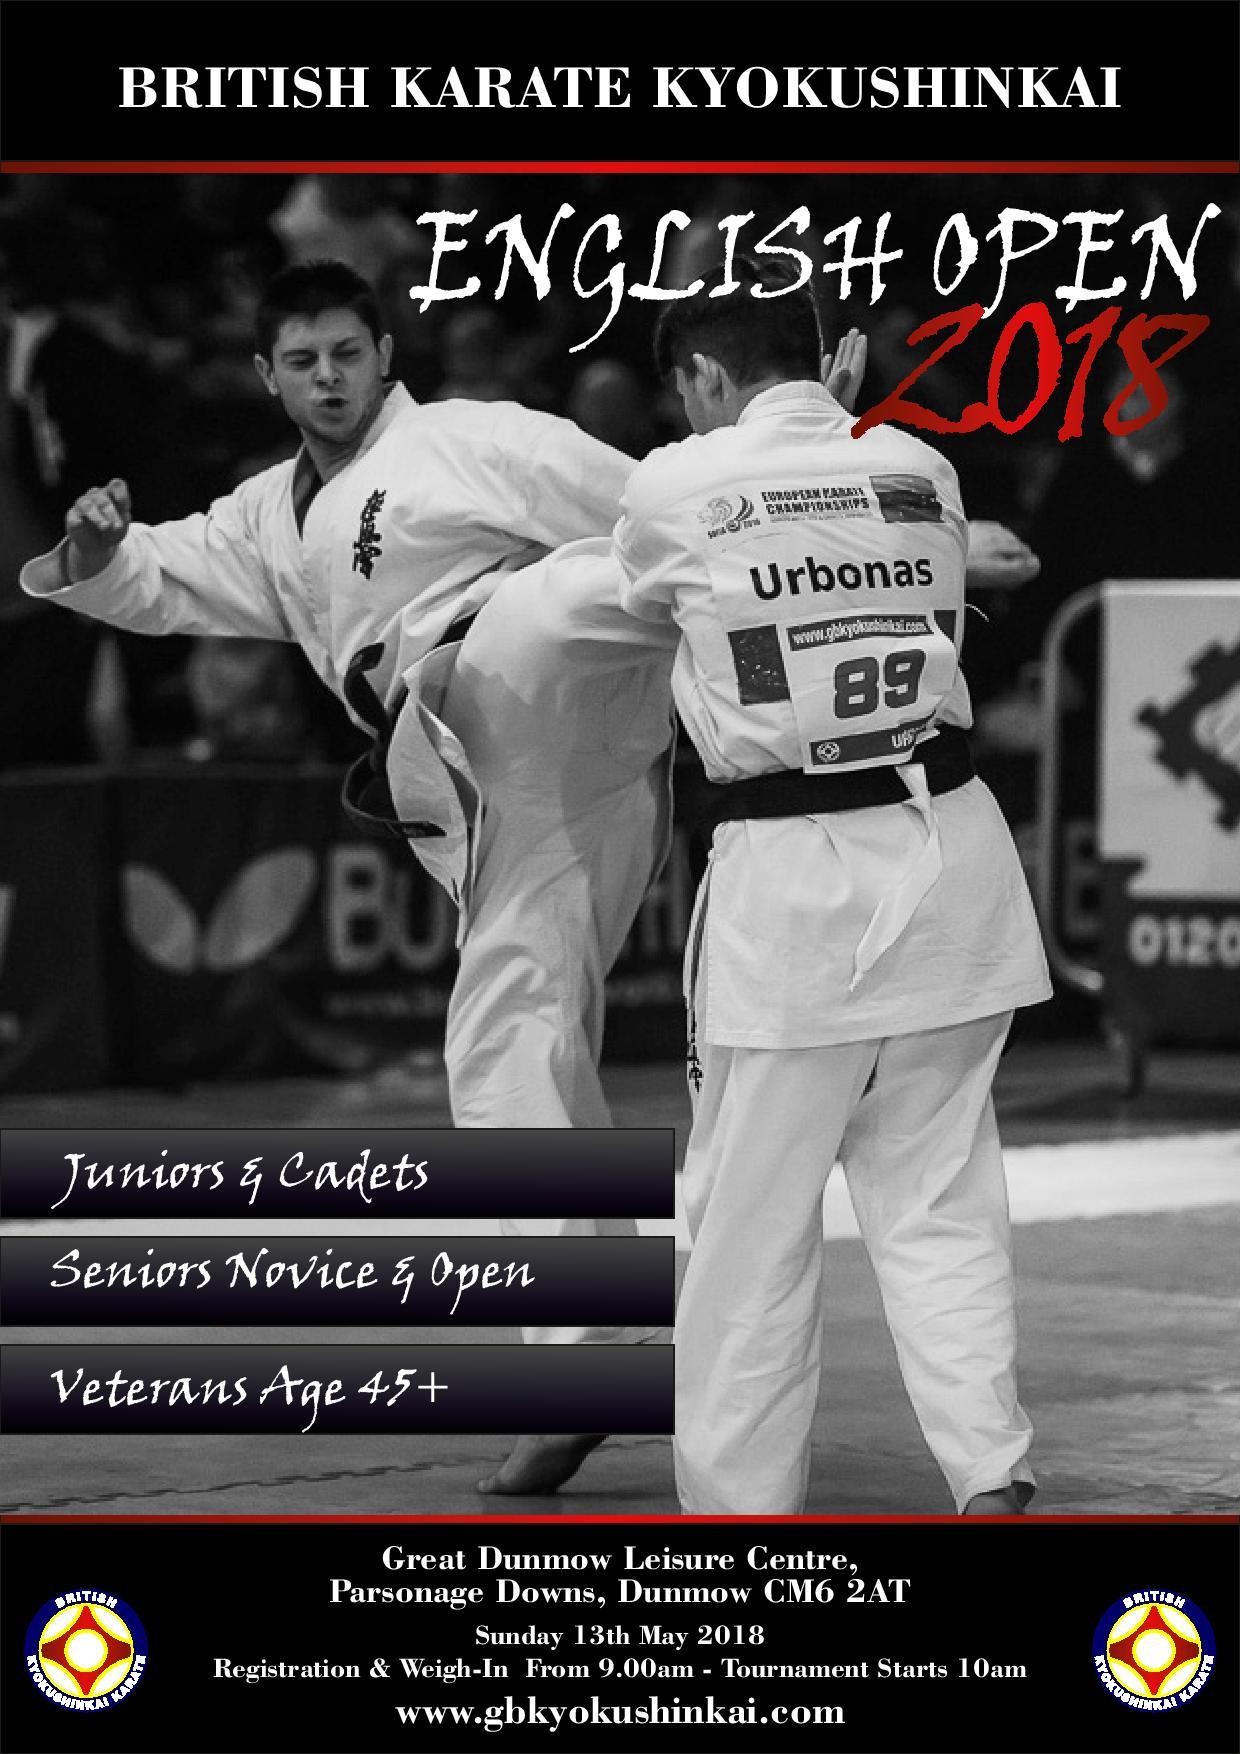 BKK English Open Tournament 2018-page-001.jpg